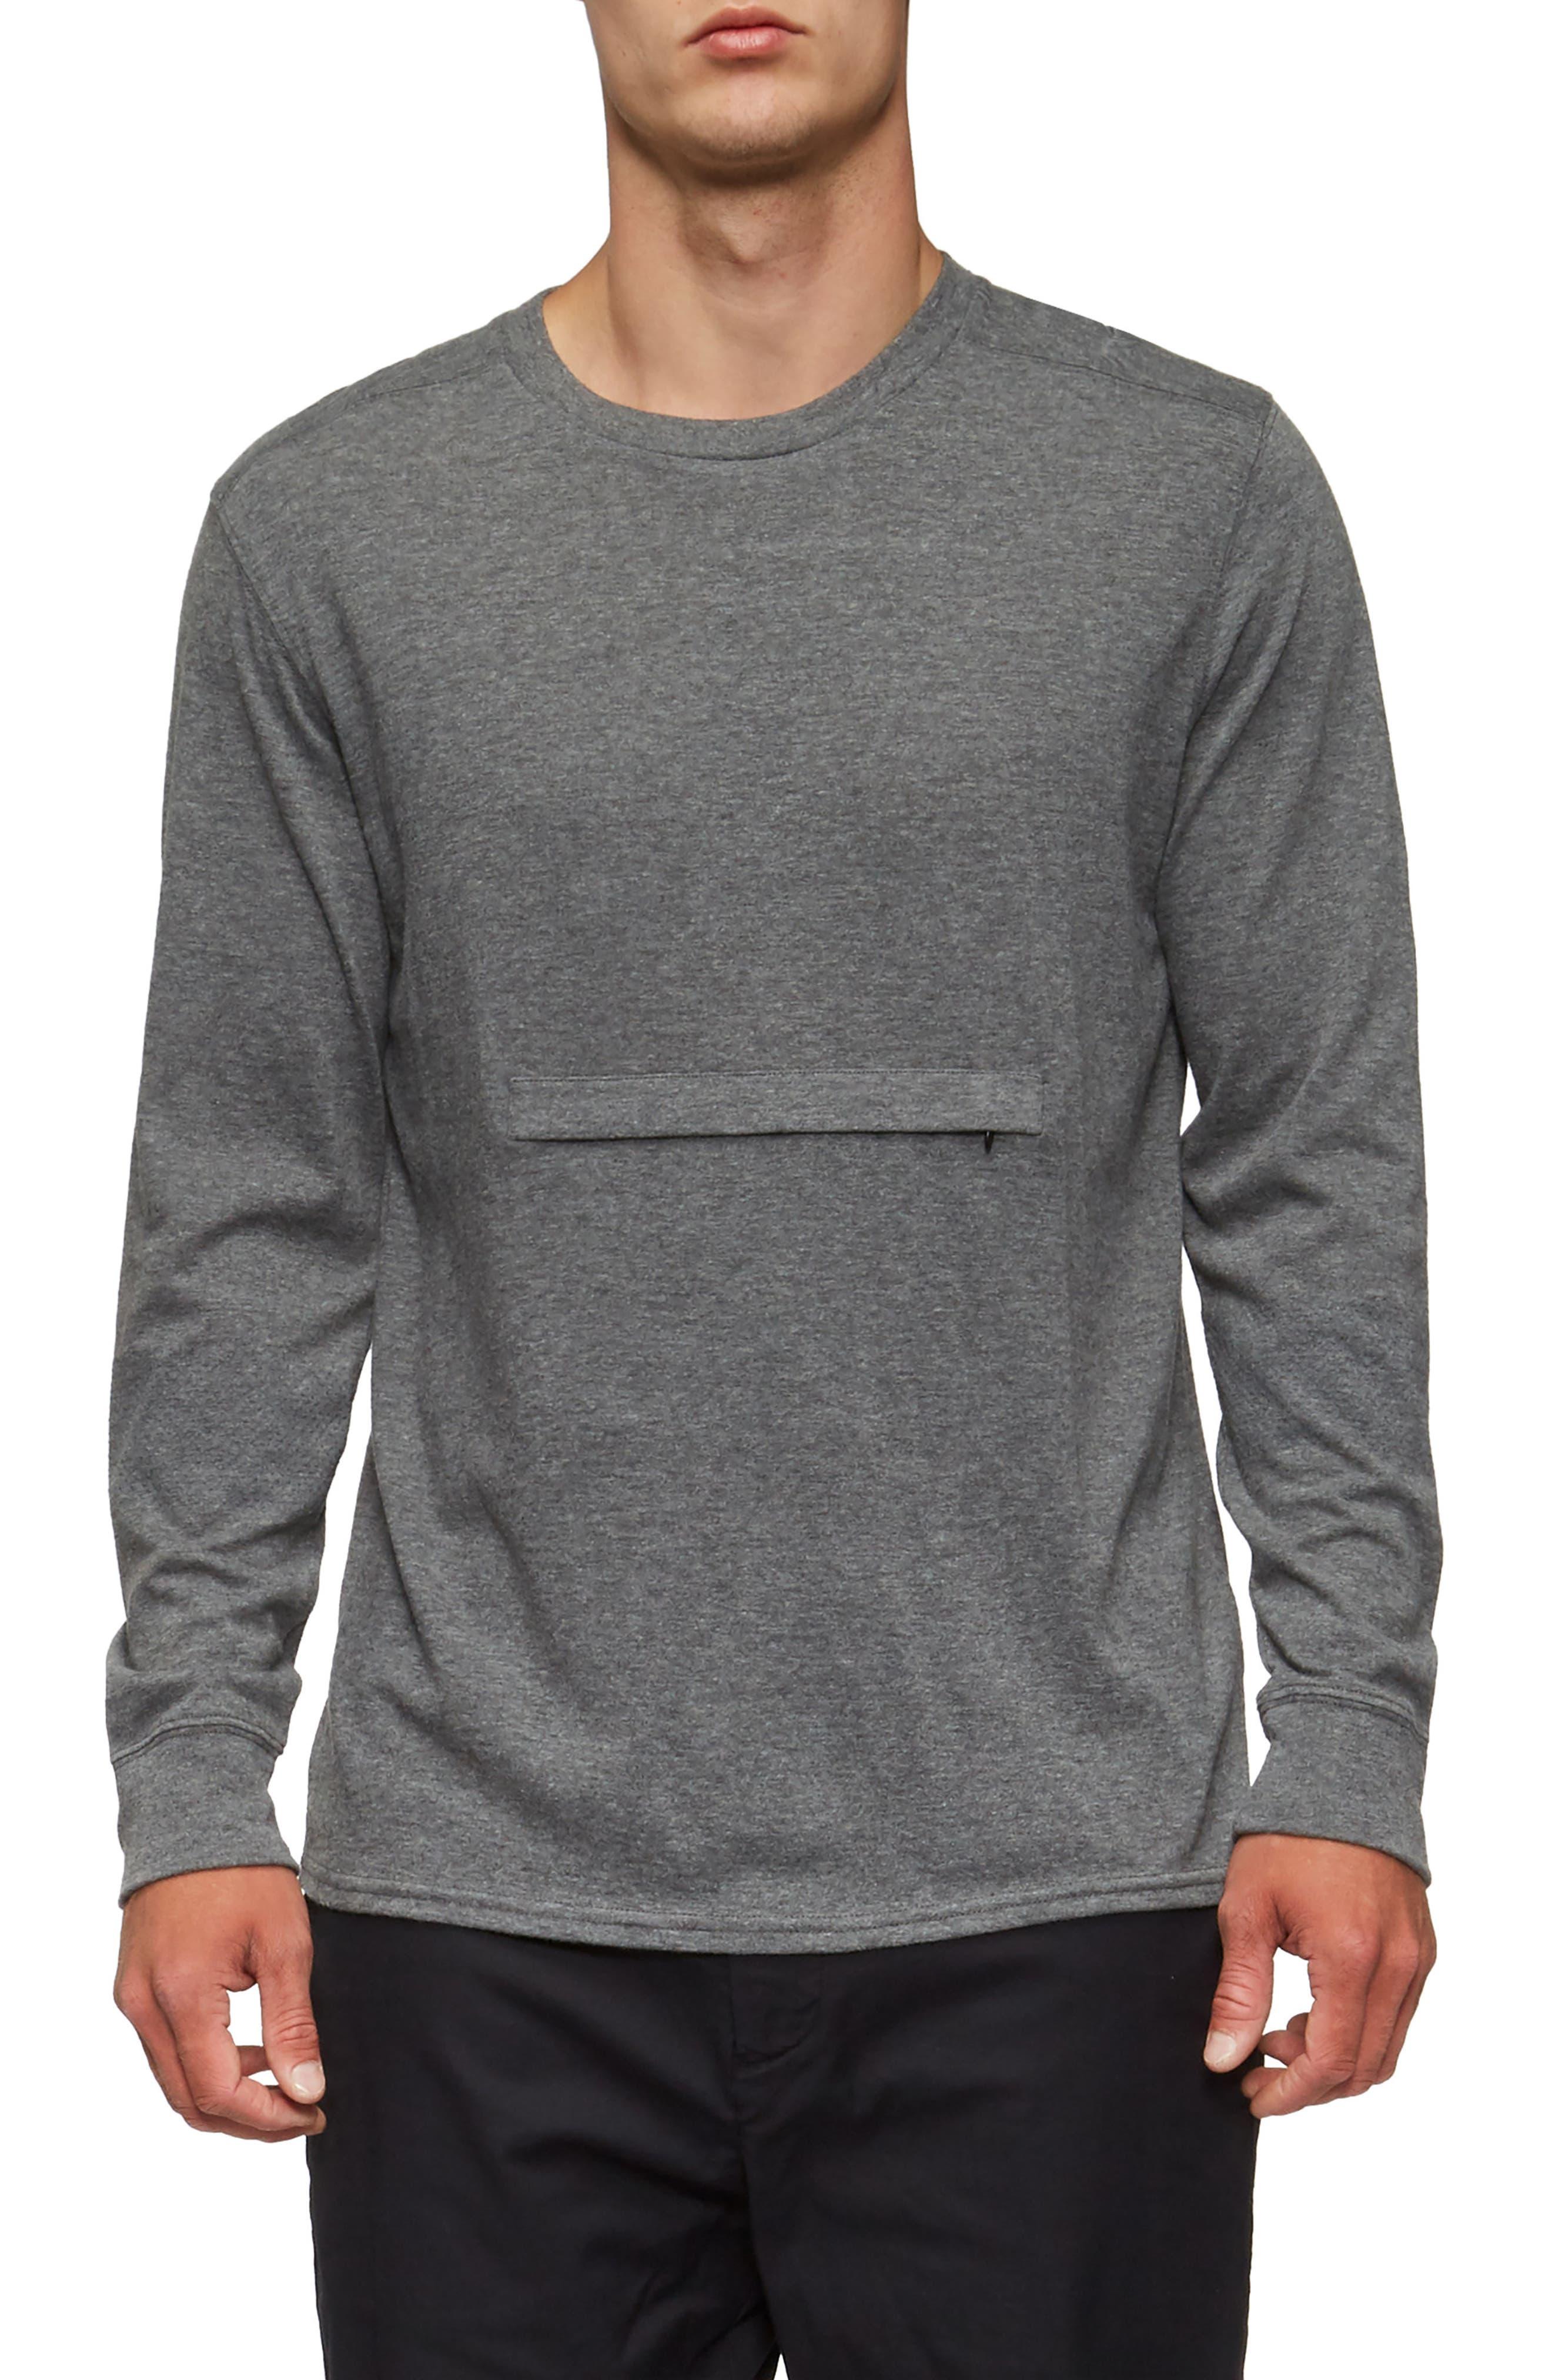 Lowell Long Sleeve T-Shirt,                             Main thumbnail 1, color,                             Heather Grey